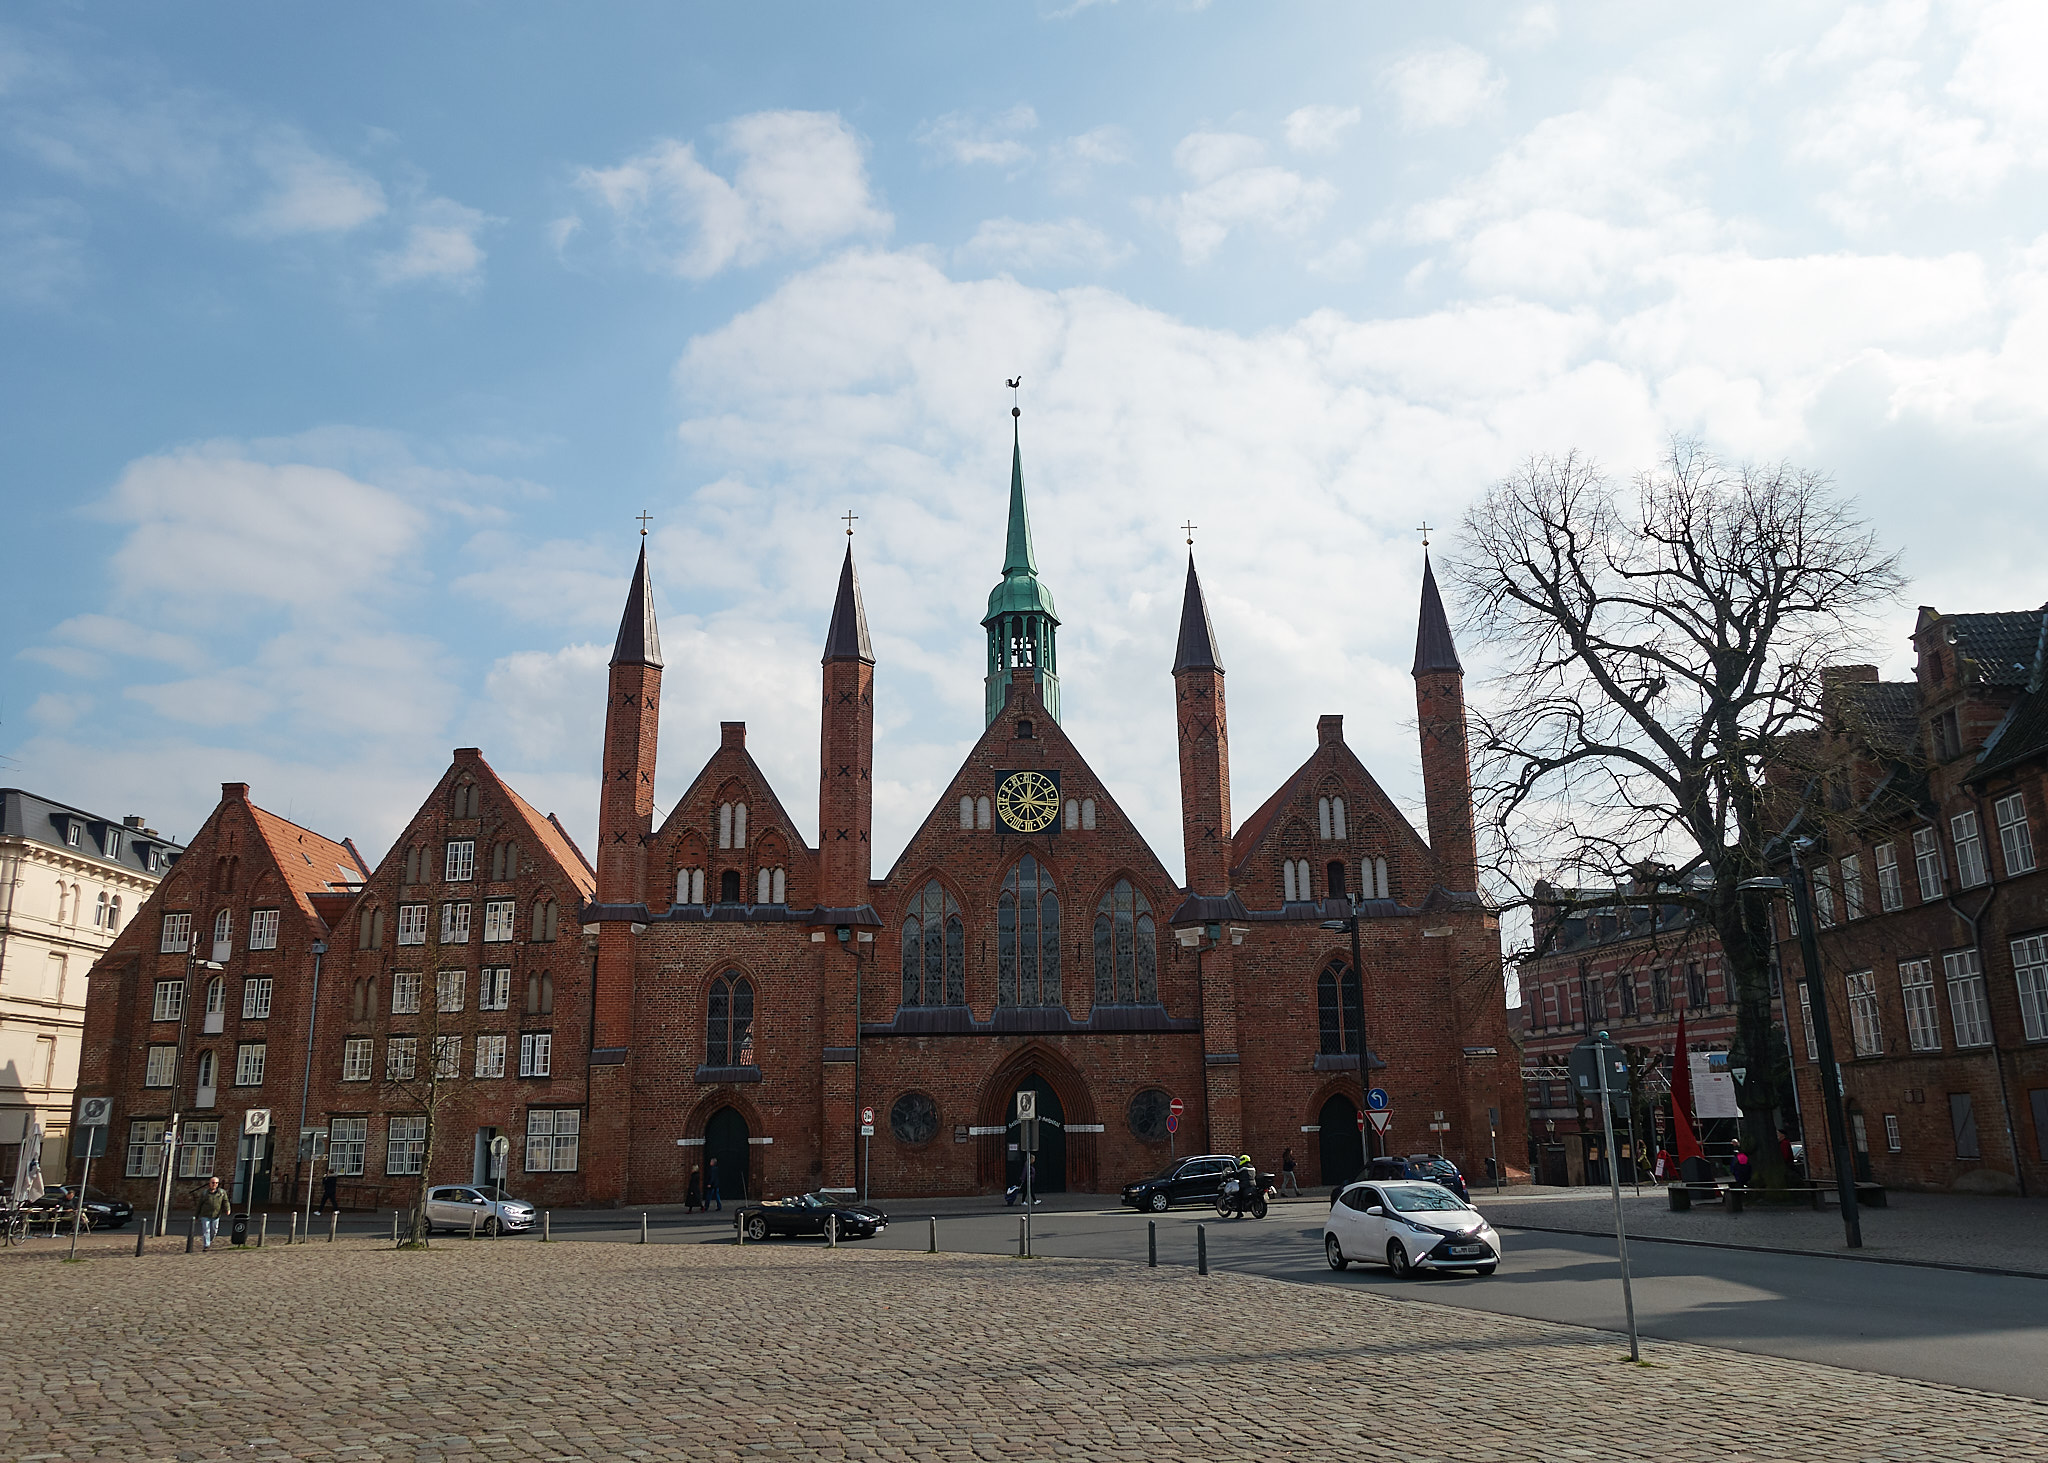 20190330-Lübeck-279.jpg